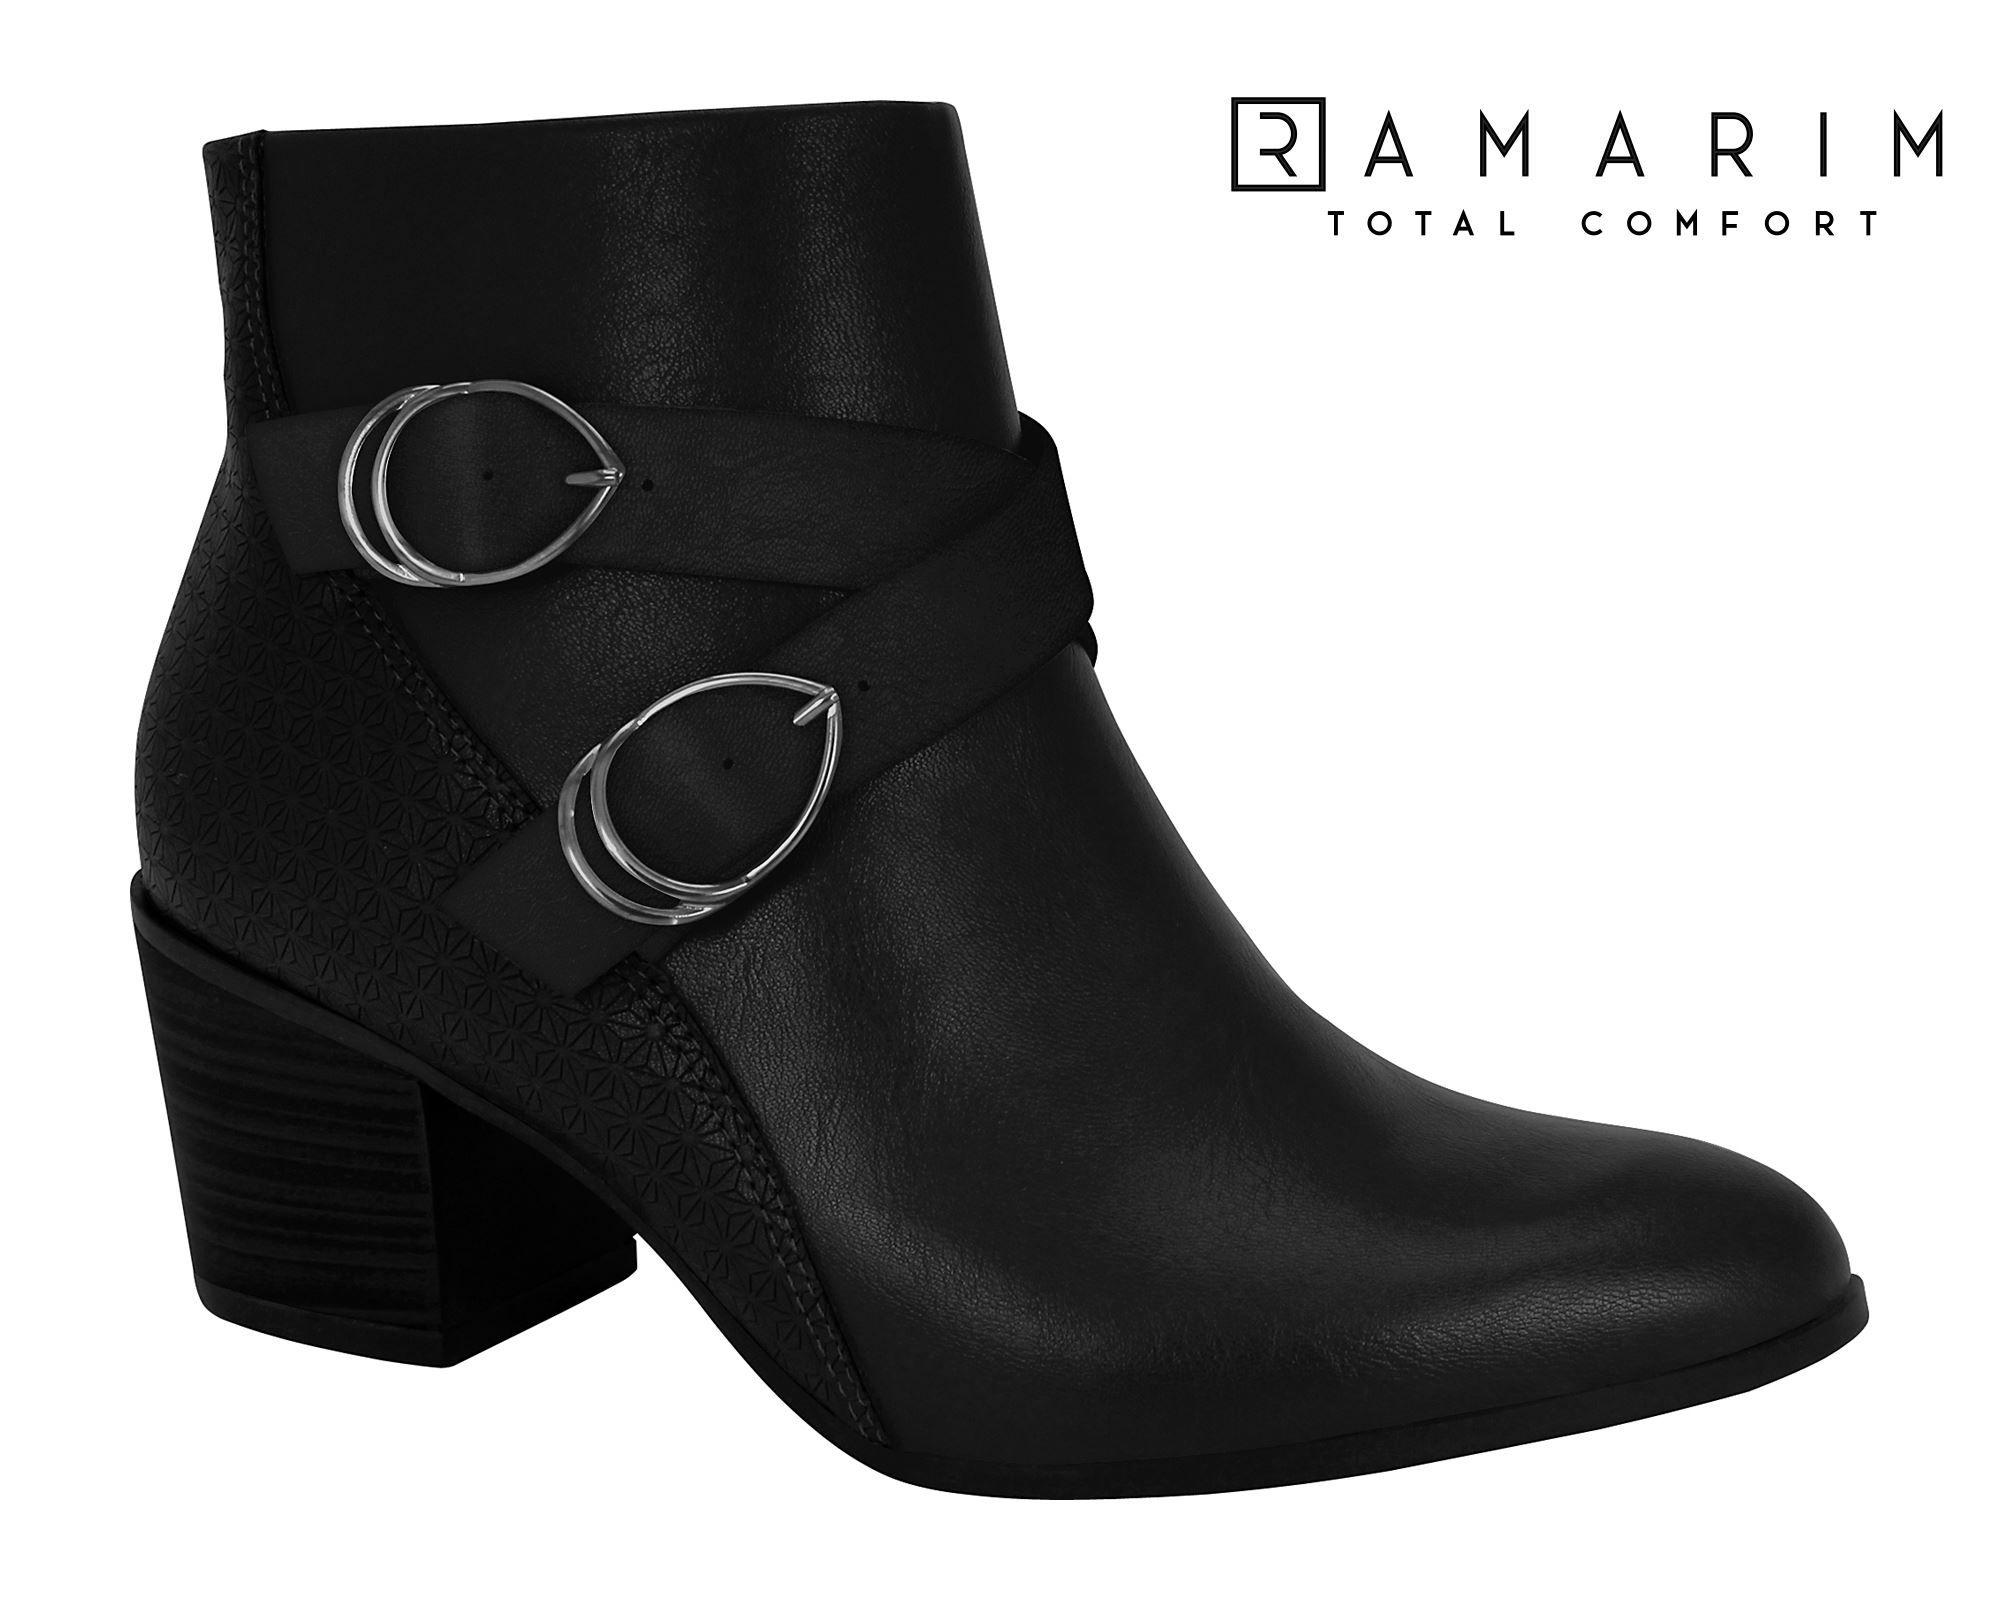 Bota Ramarim Cano Curto Salto Grosso Ankle Boot 1964101 Feminina